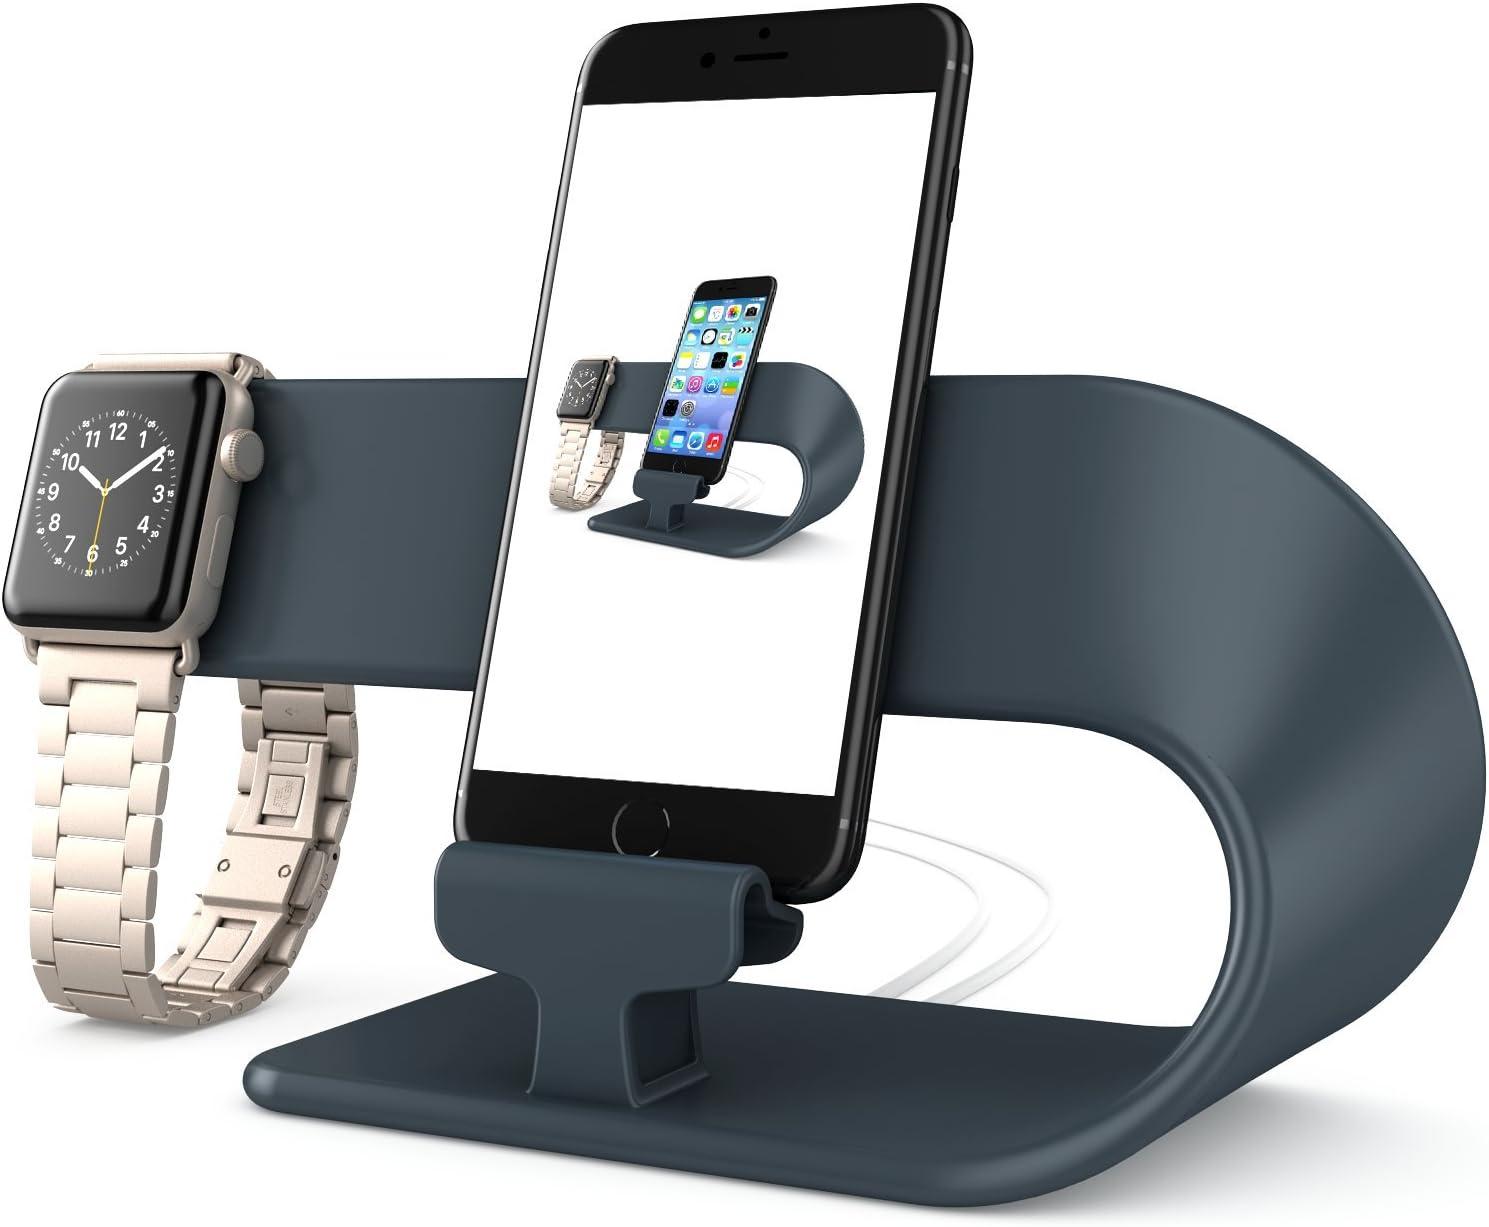 Sinn solved the Apple Watch problem